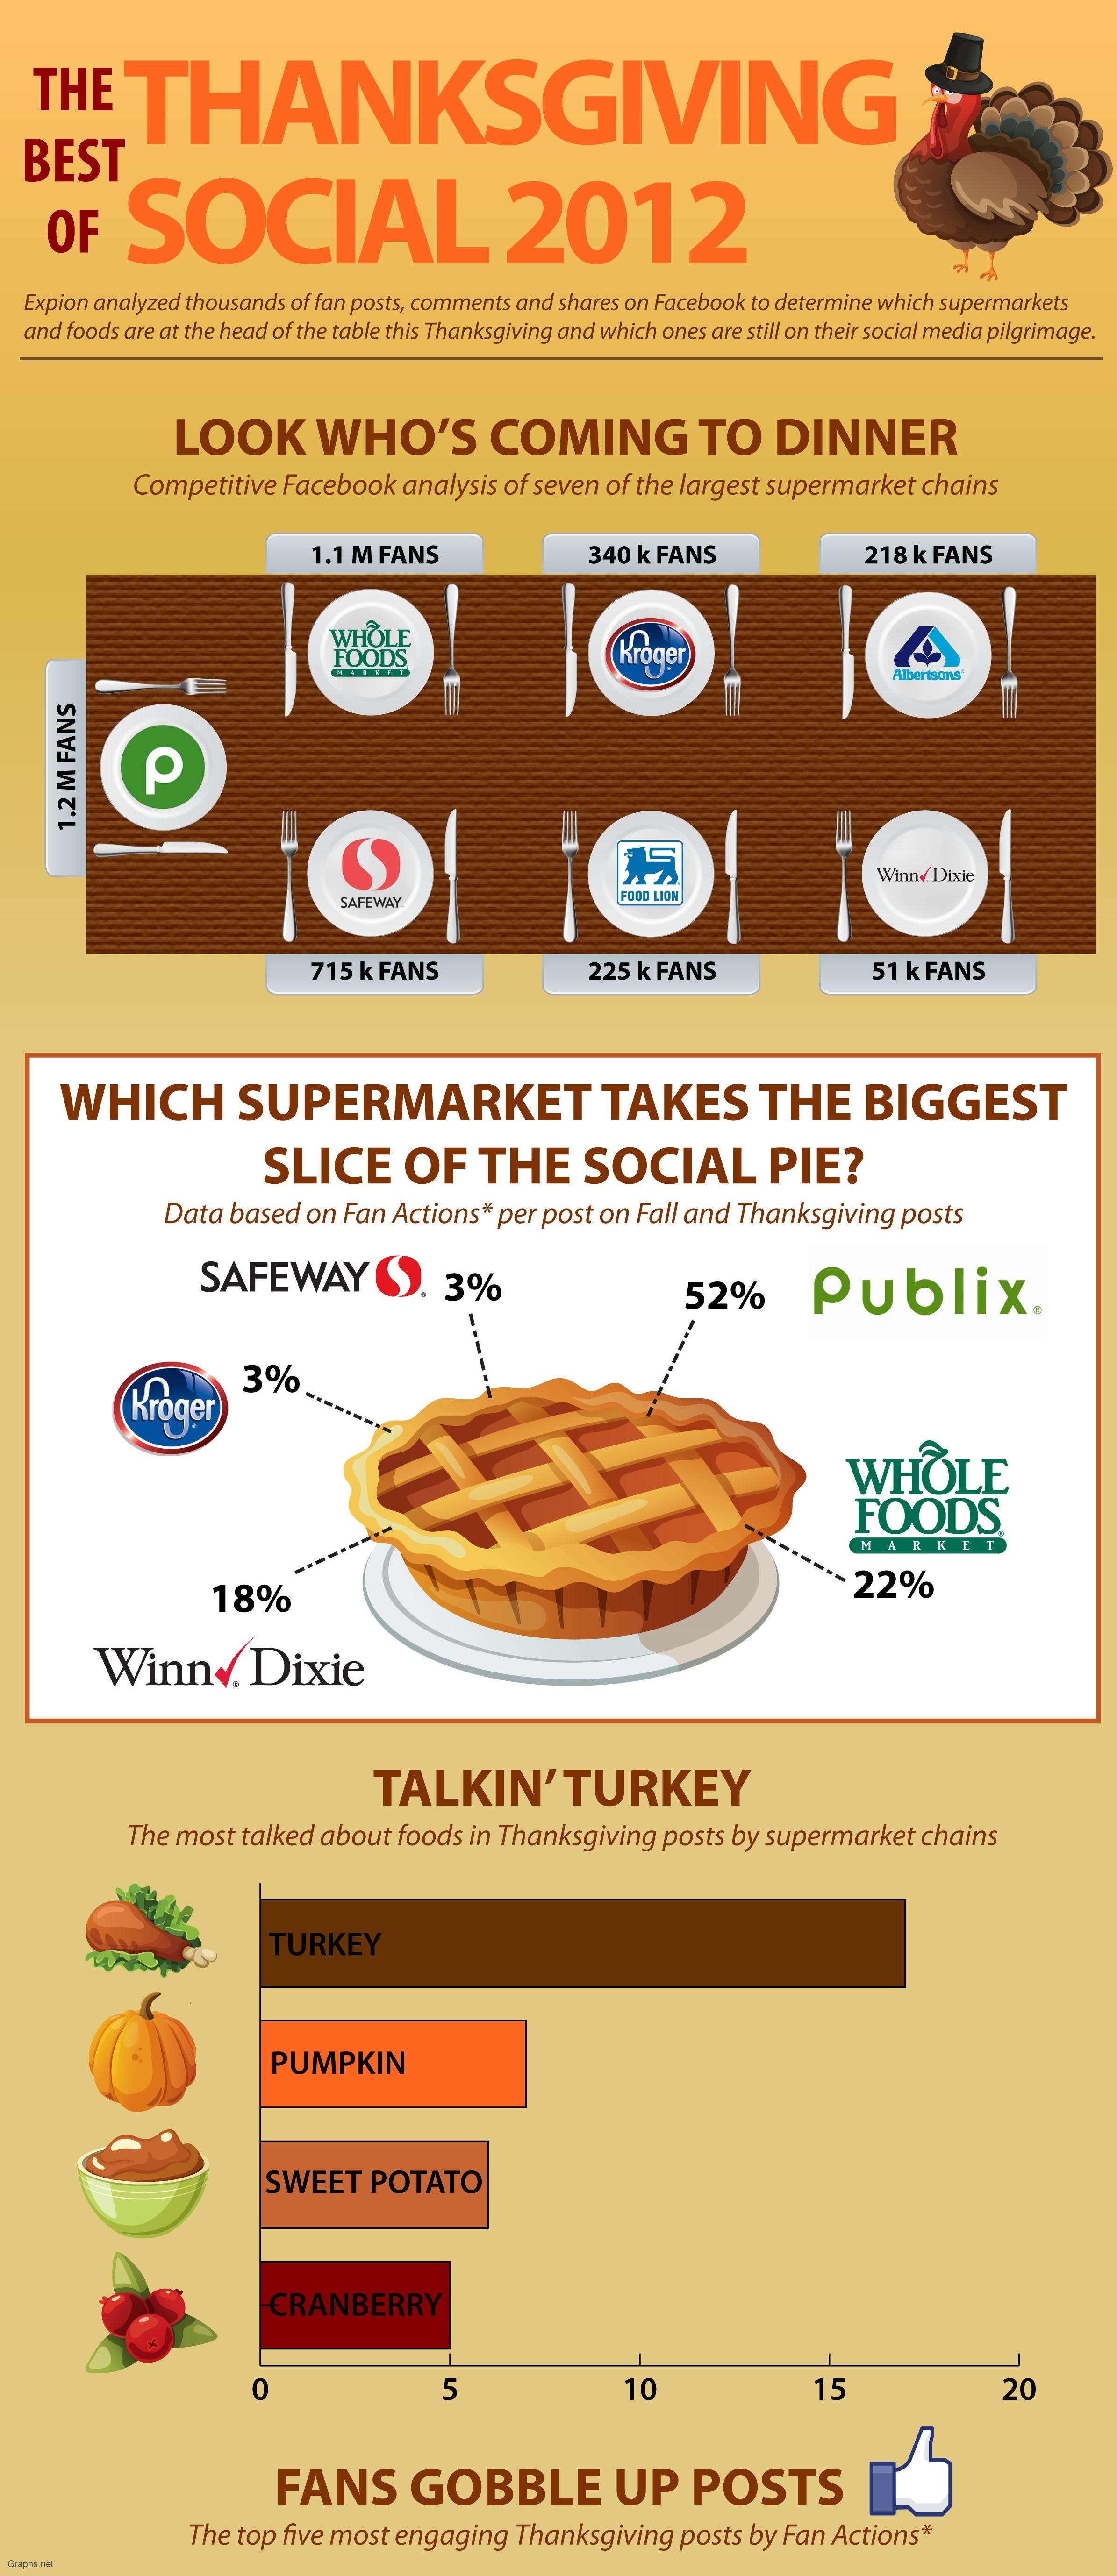 Largest Supermarket Chains on Social Media